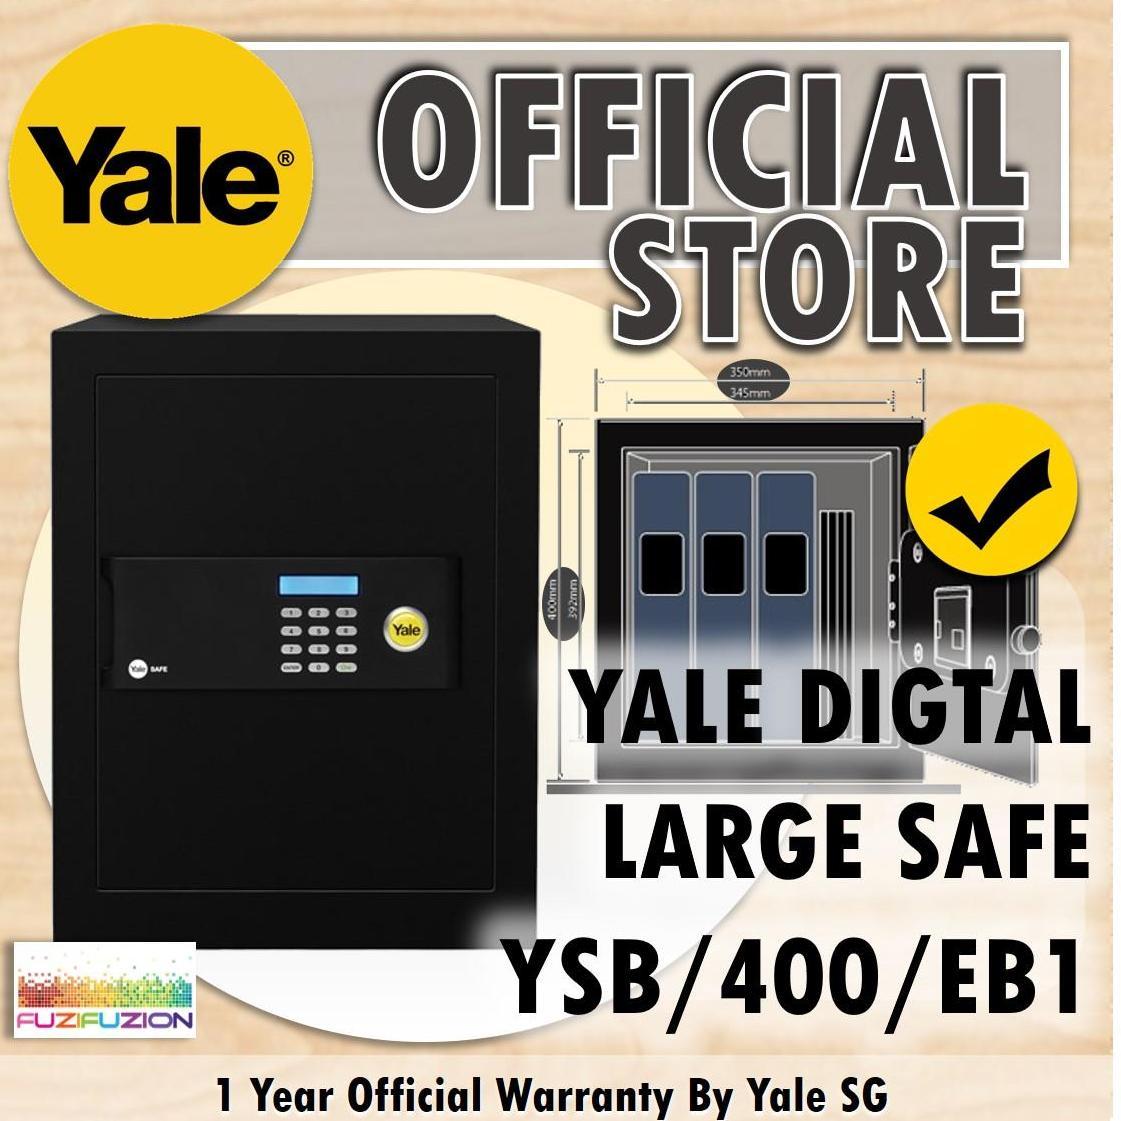 Yale YSB/400/EB1 Large Security Digital Safe Box